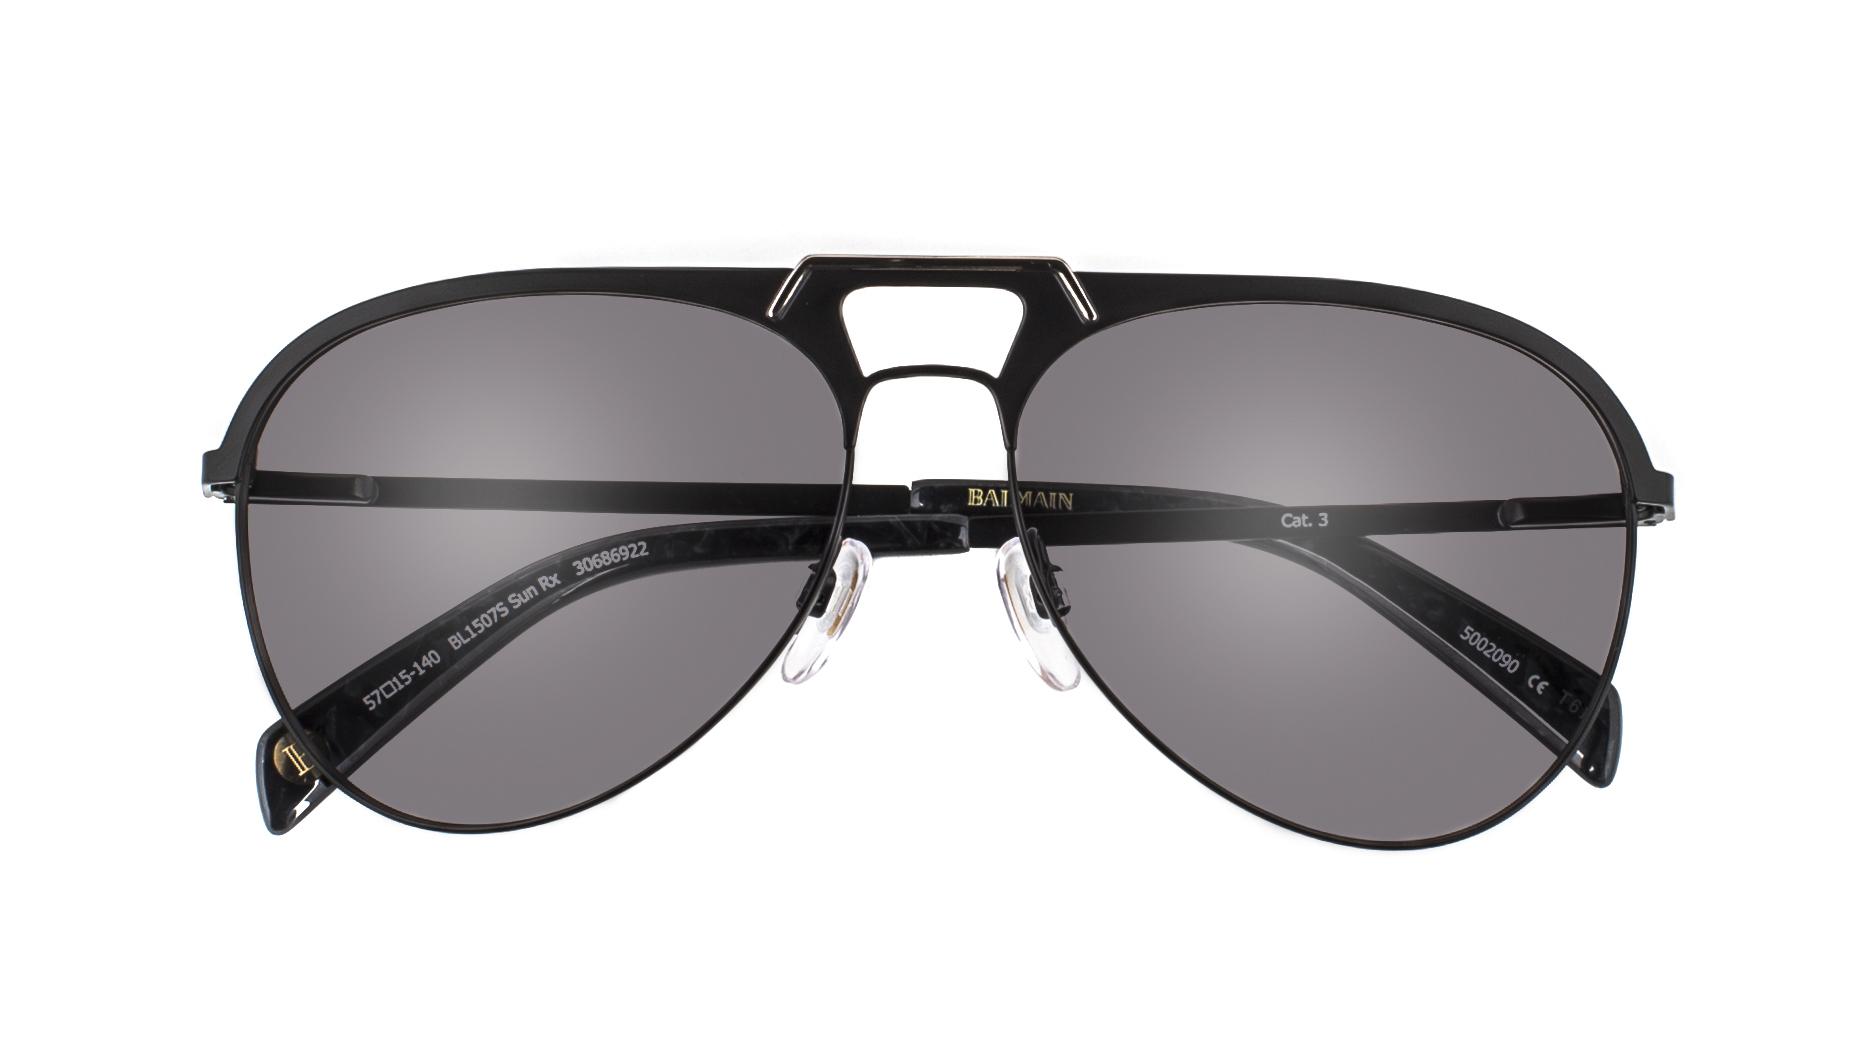 Balmain x Specsavers BL1507S SUN RX 30686922 - RRP 2 pairs single vision $459